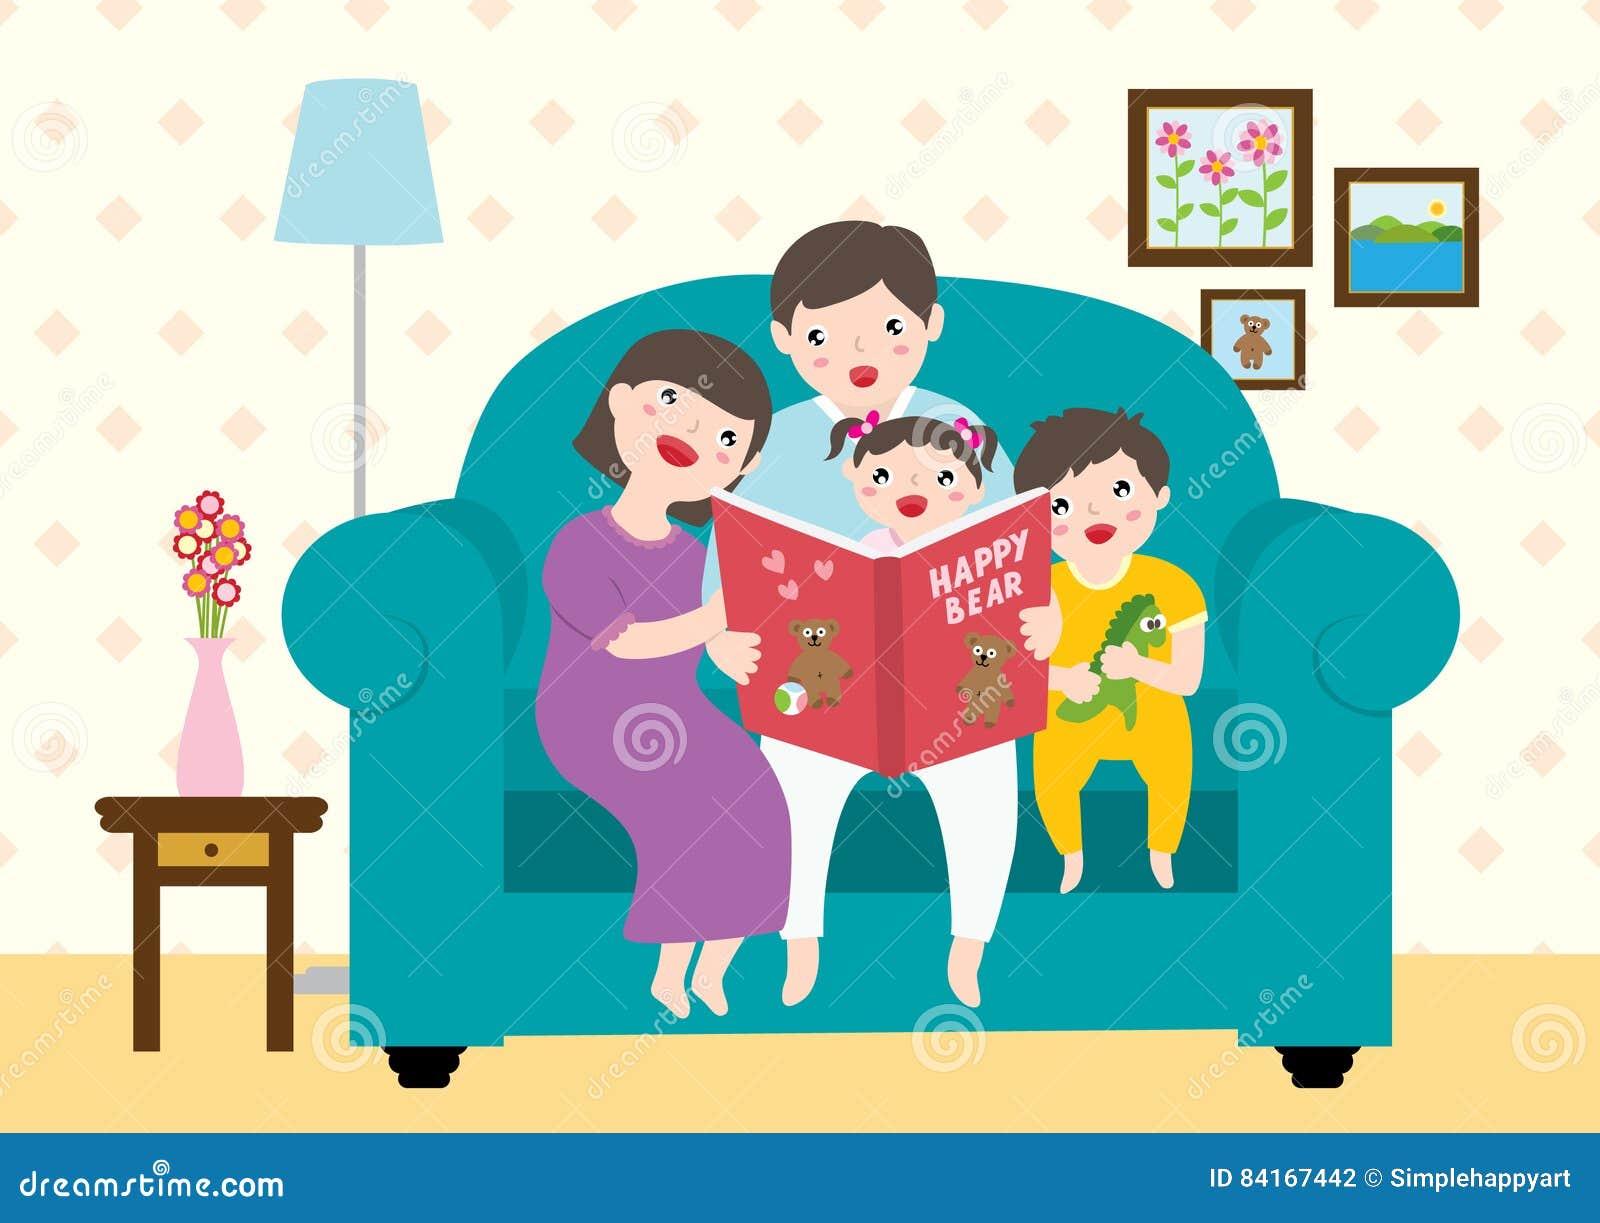 Drawing Of A Happy Family Enjoying Reading `Happy Bear` Storybooks